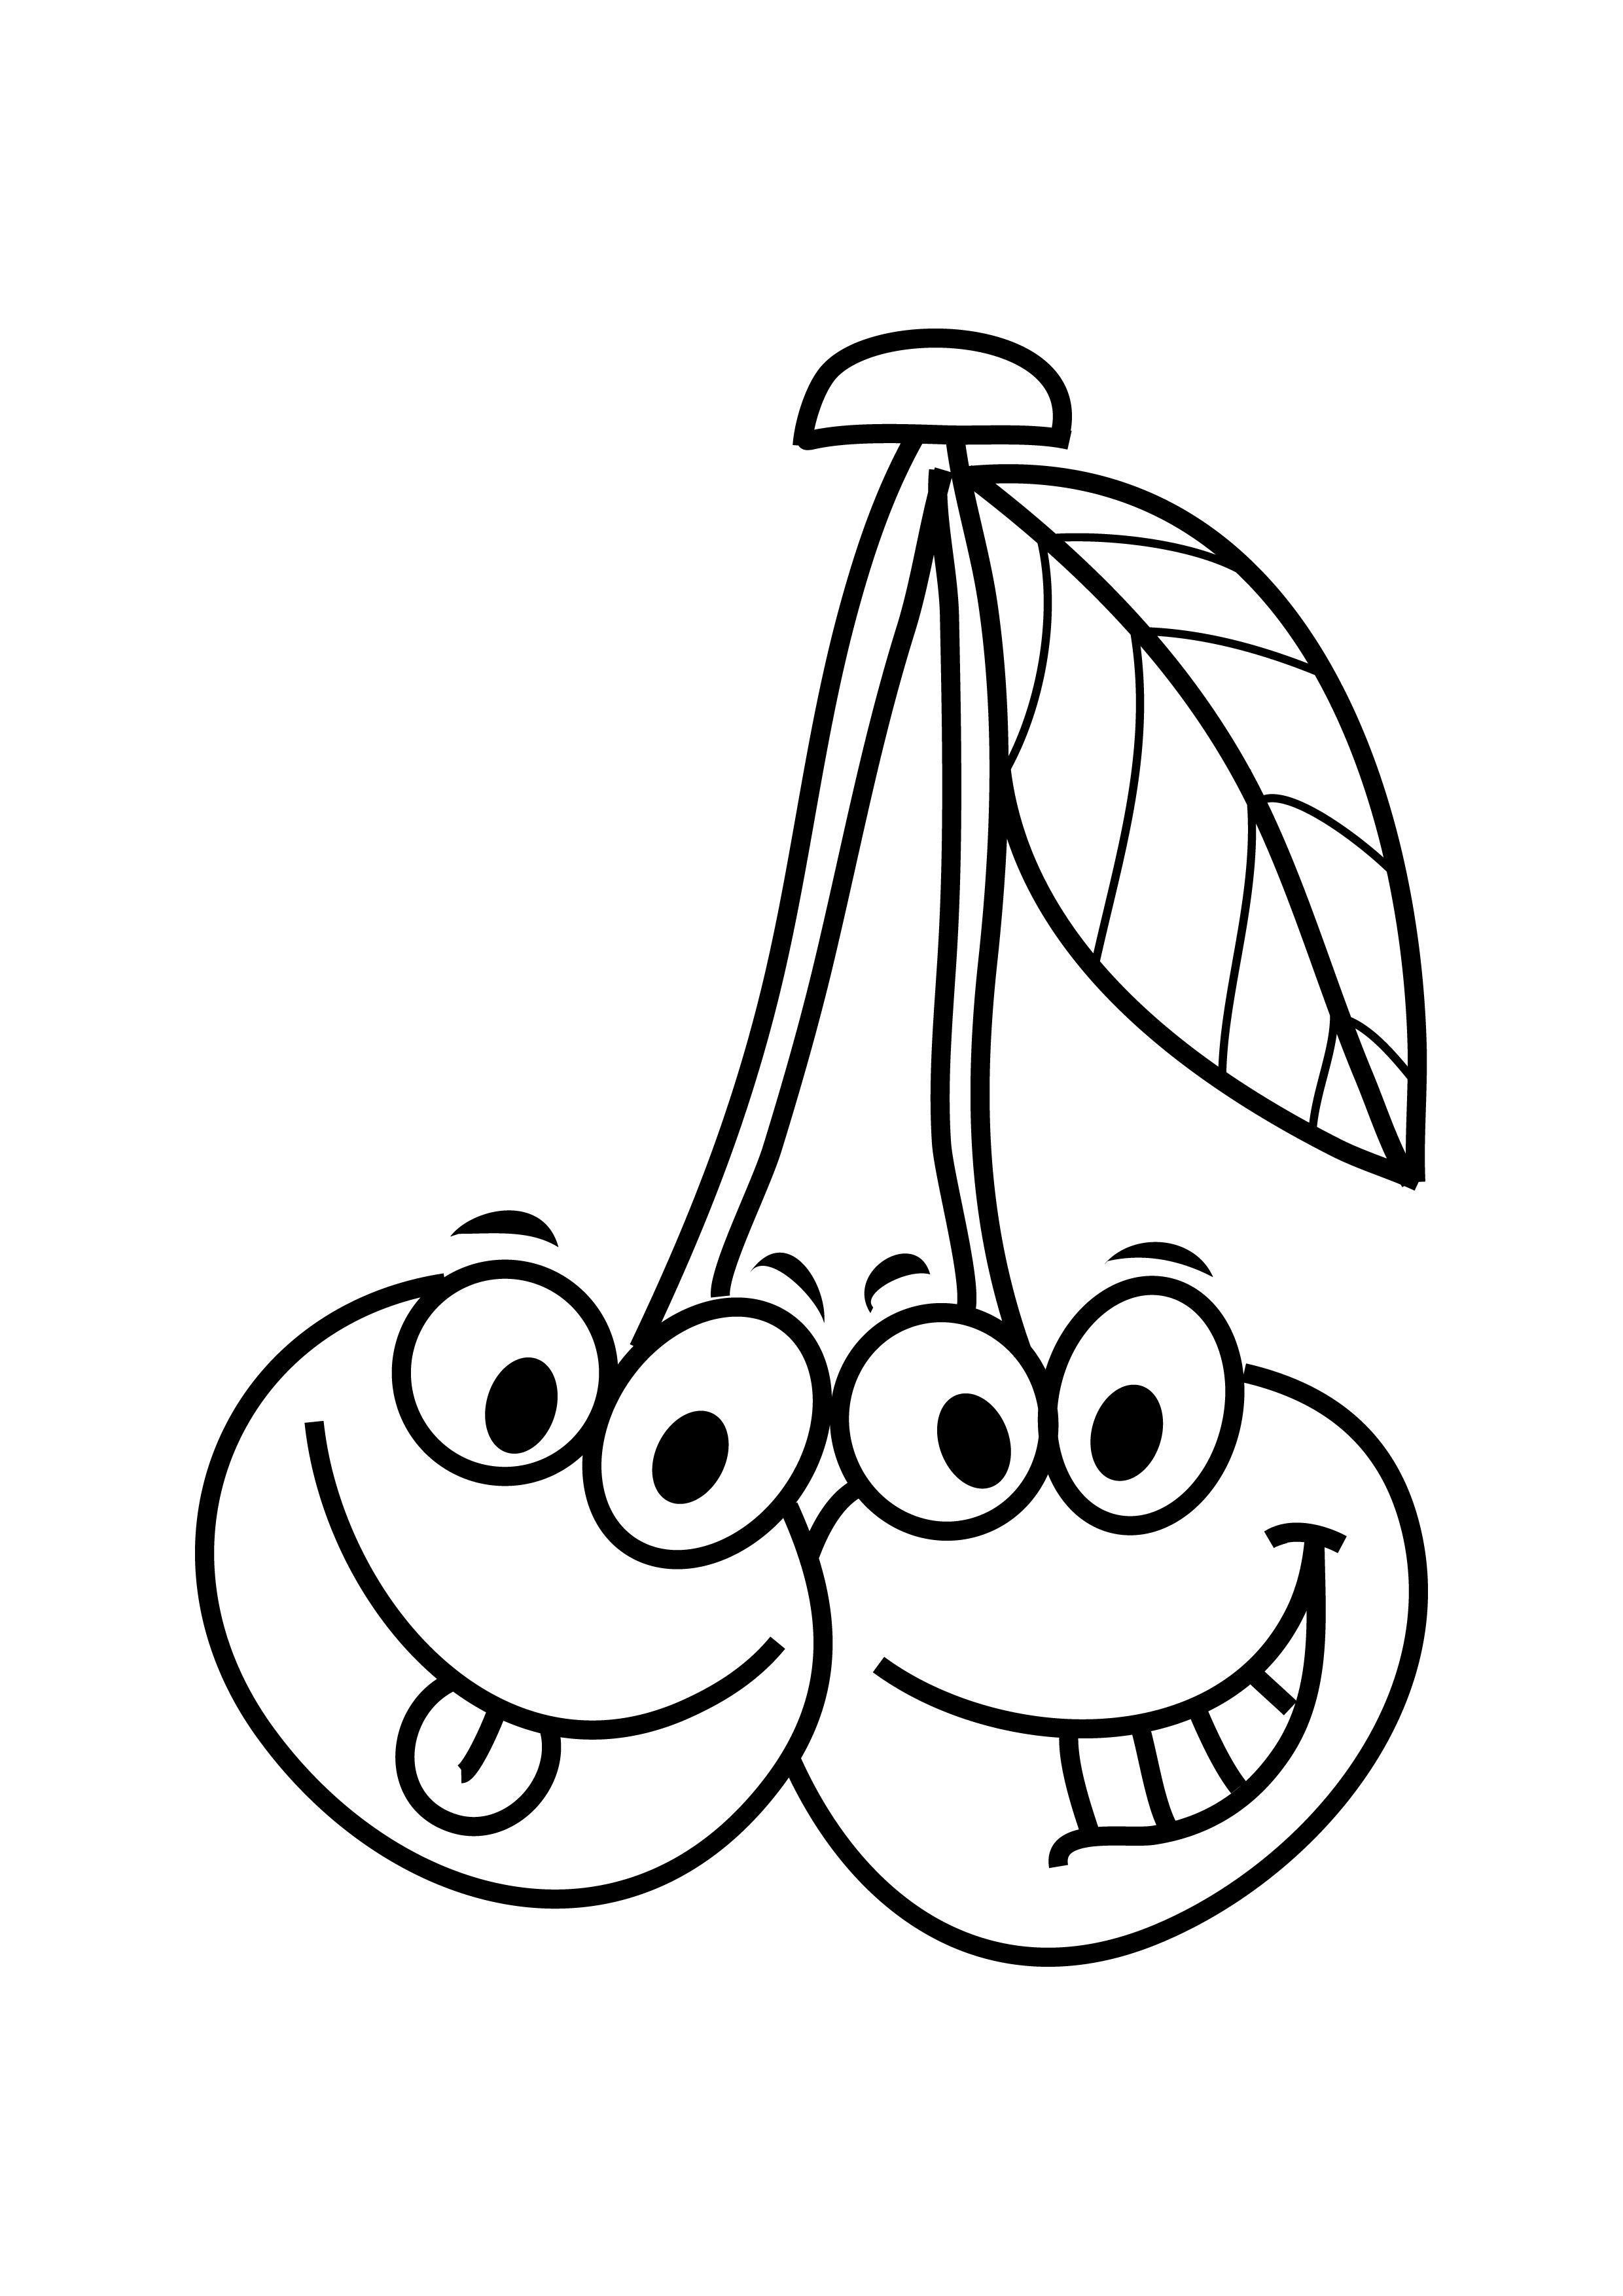 13 Best Images Of Matching Preschool Worksheets Fruits